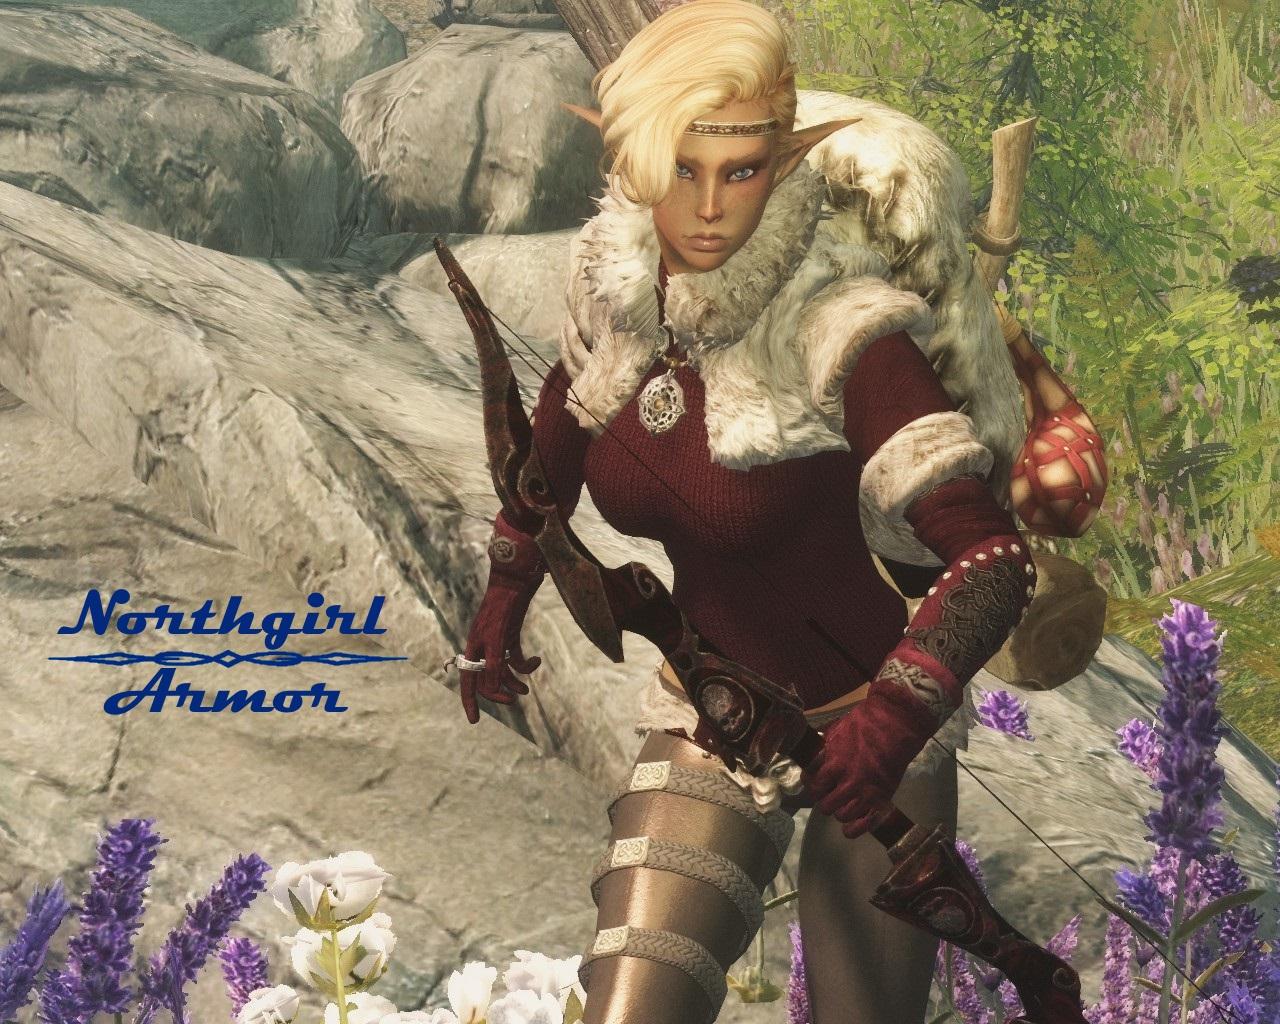 Northgirl_Armor_UNP_and_the_Retexture_L.jpg